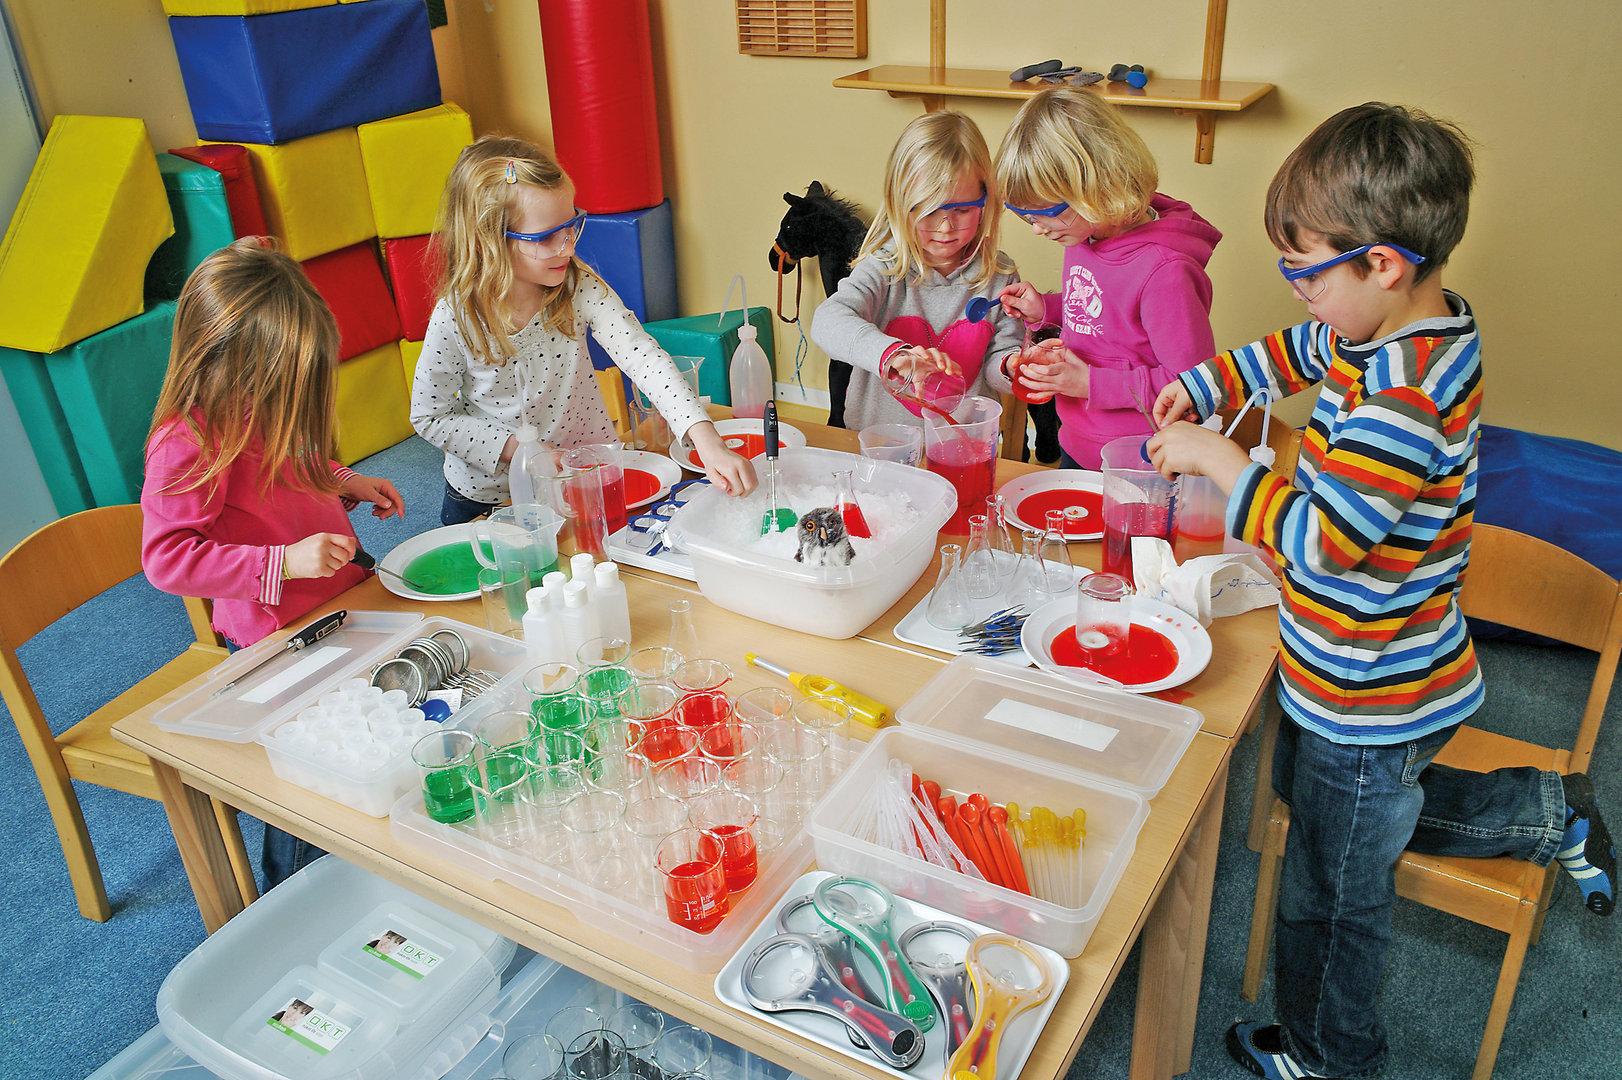 Winlab Forscher Kids Set - 87 Teile Experimentierset